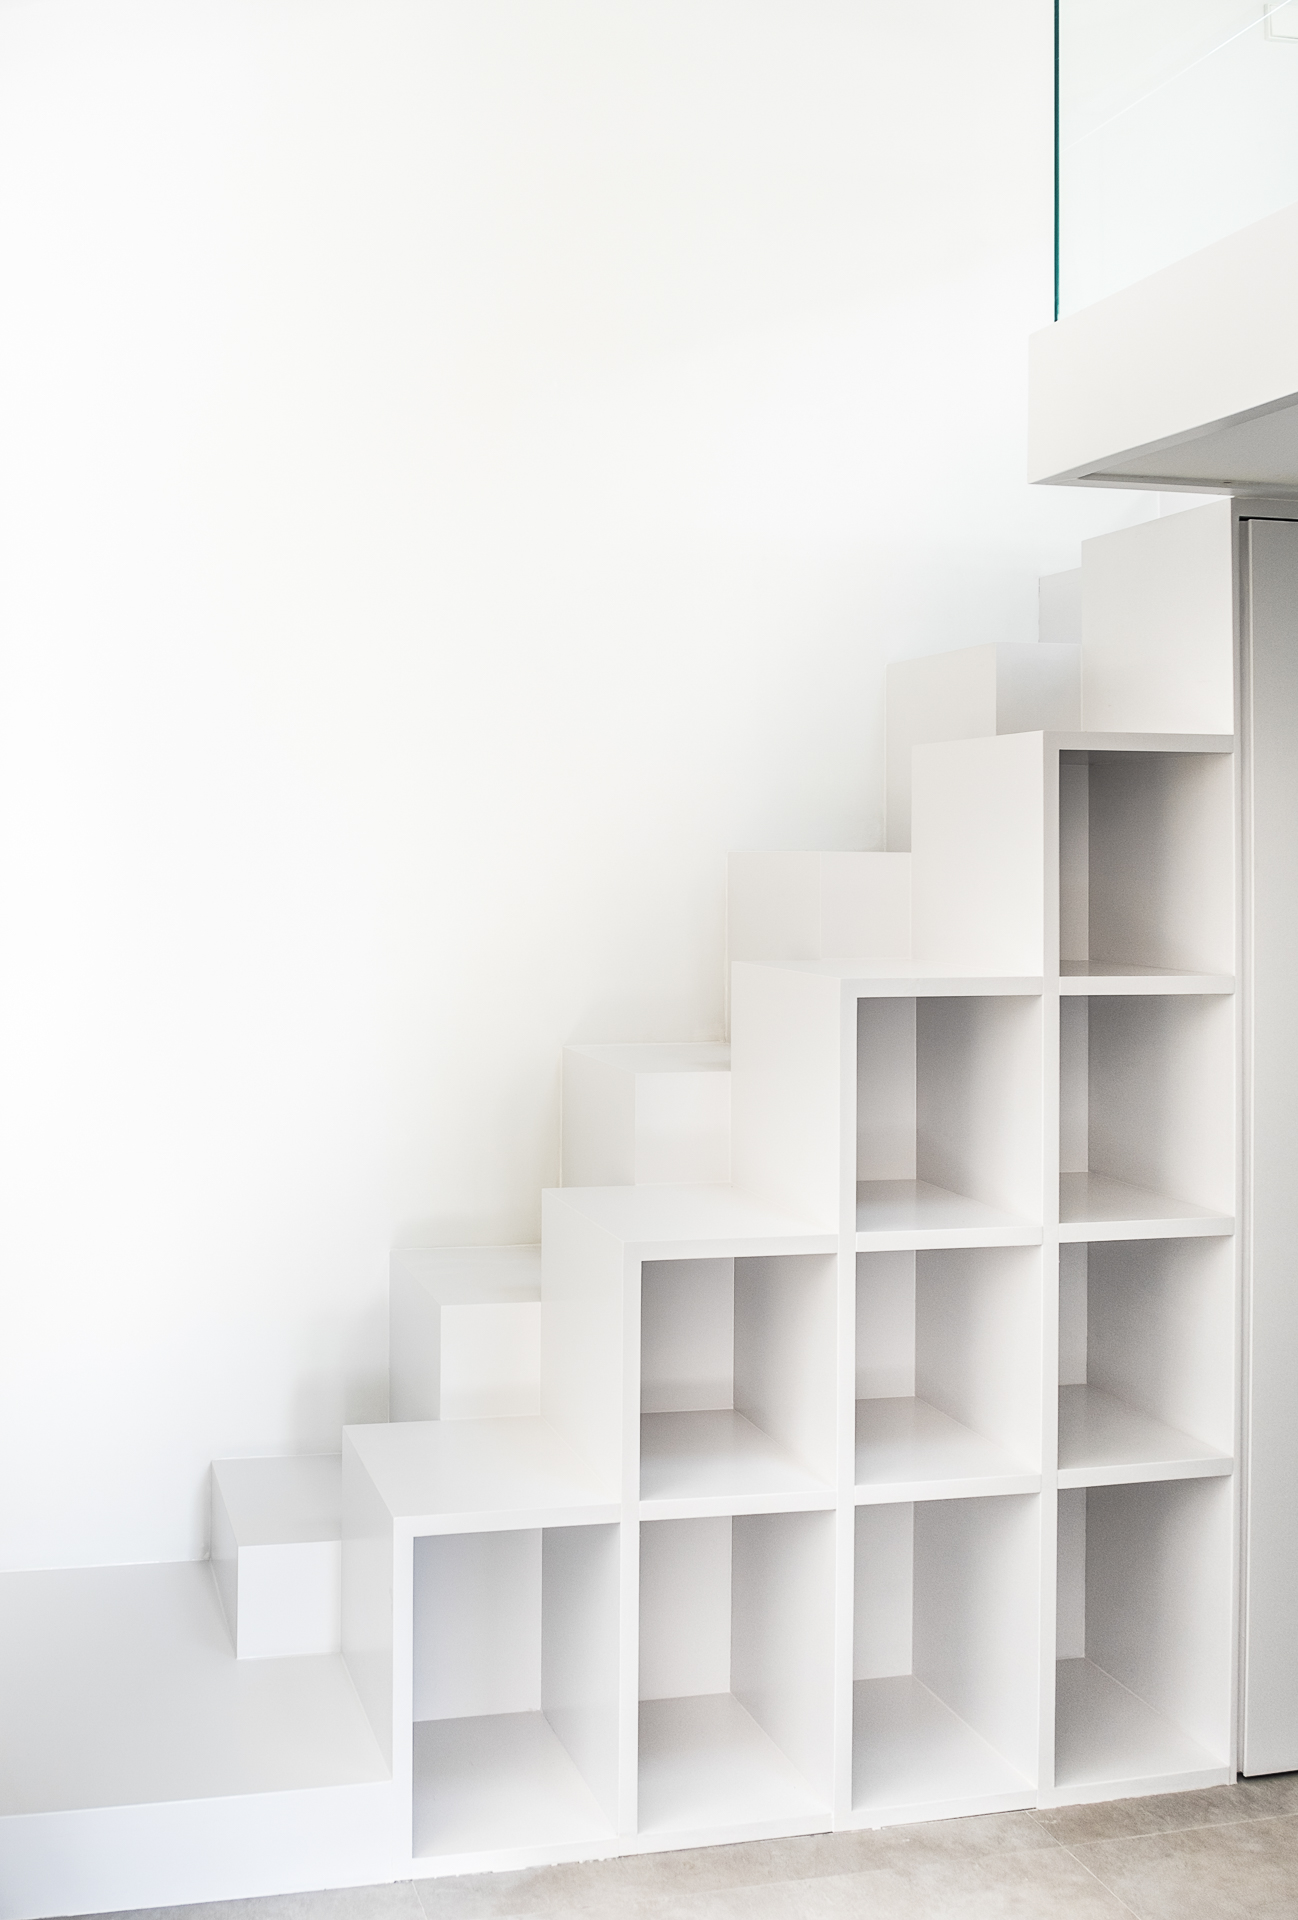 GabrielAbreu_Maroto_Ibañez_arquitectos08